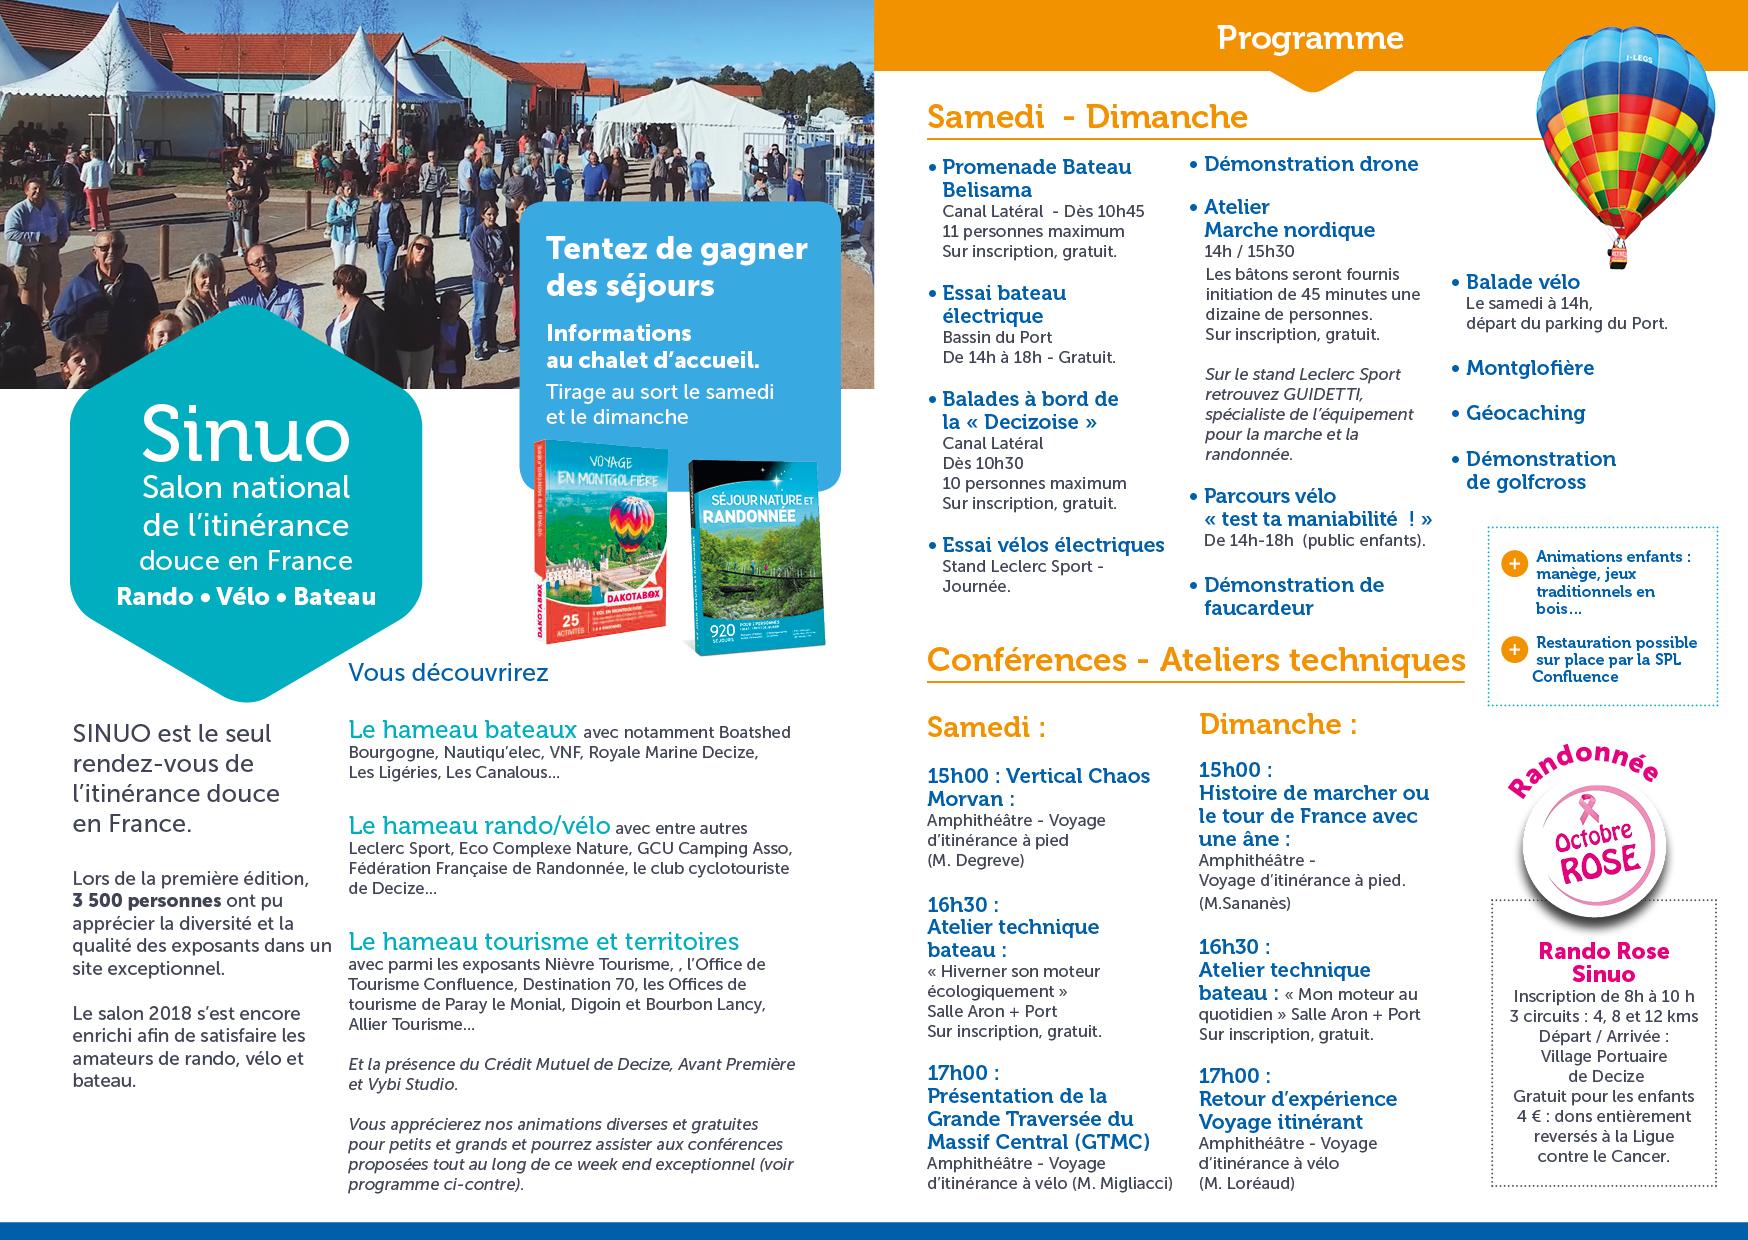 Programme Sinuo - 2018